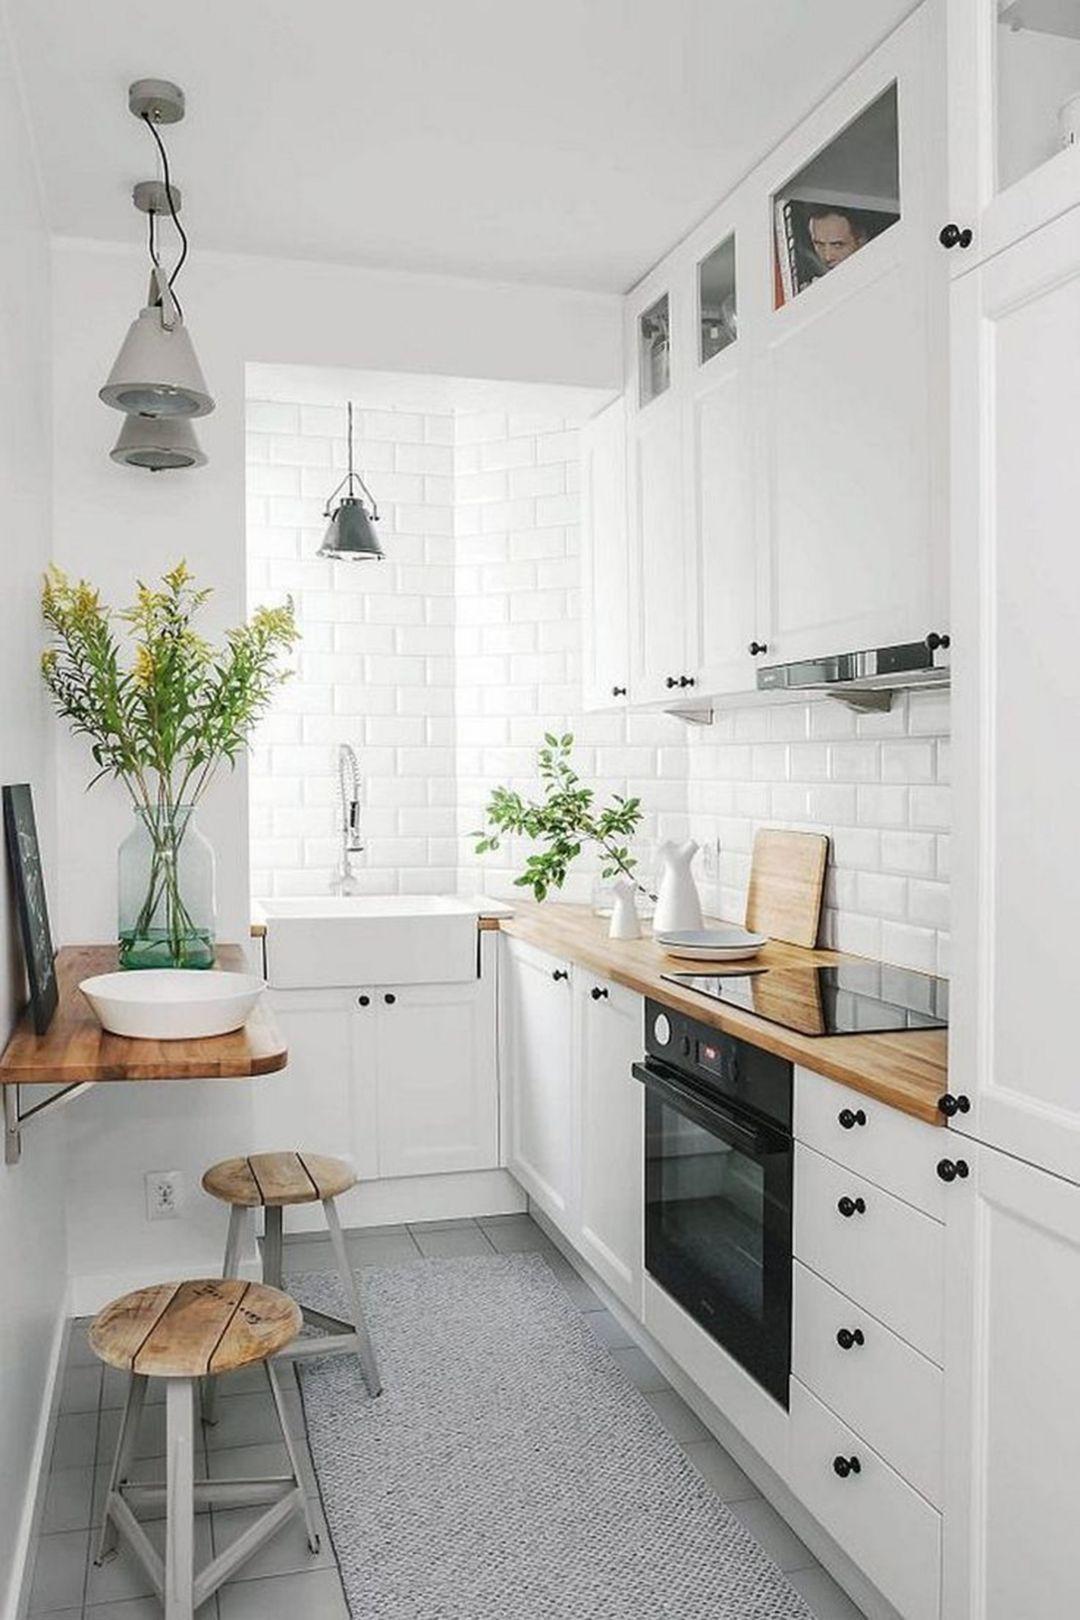 15 Beautiful Tiny Kitchen Decorating Ideas For Your Apartment Apartment Beautiful Decorating I In 2020 Small Kitchen Decor Galley Kitchen Design Small Space Kitchen